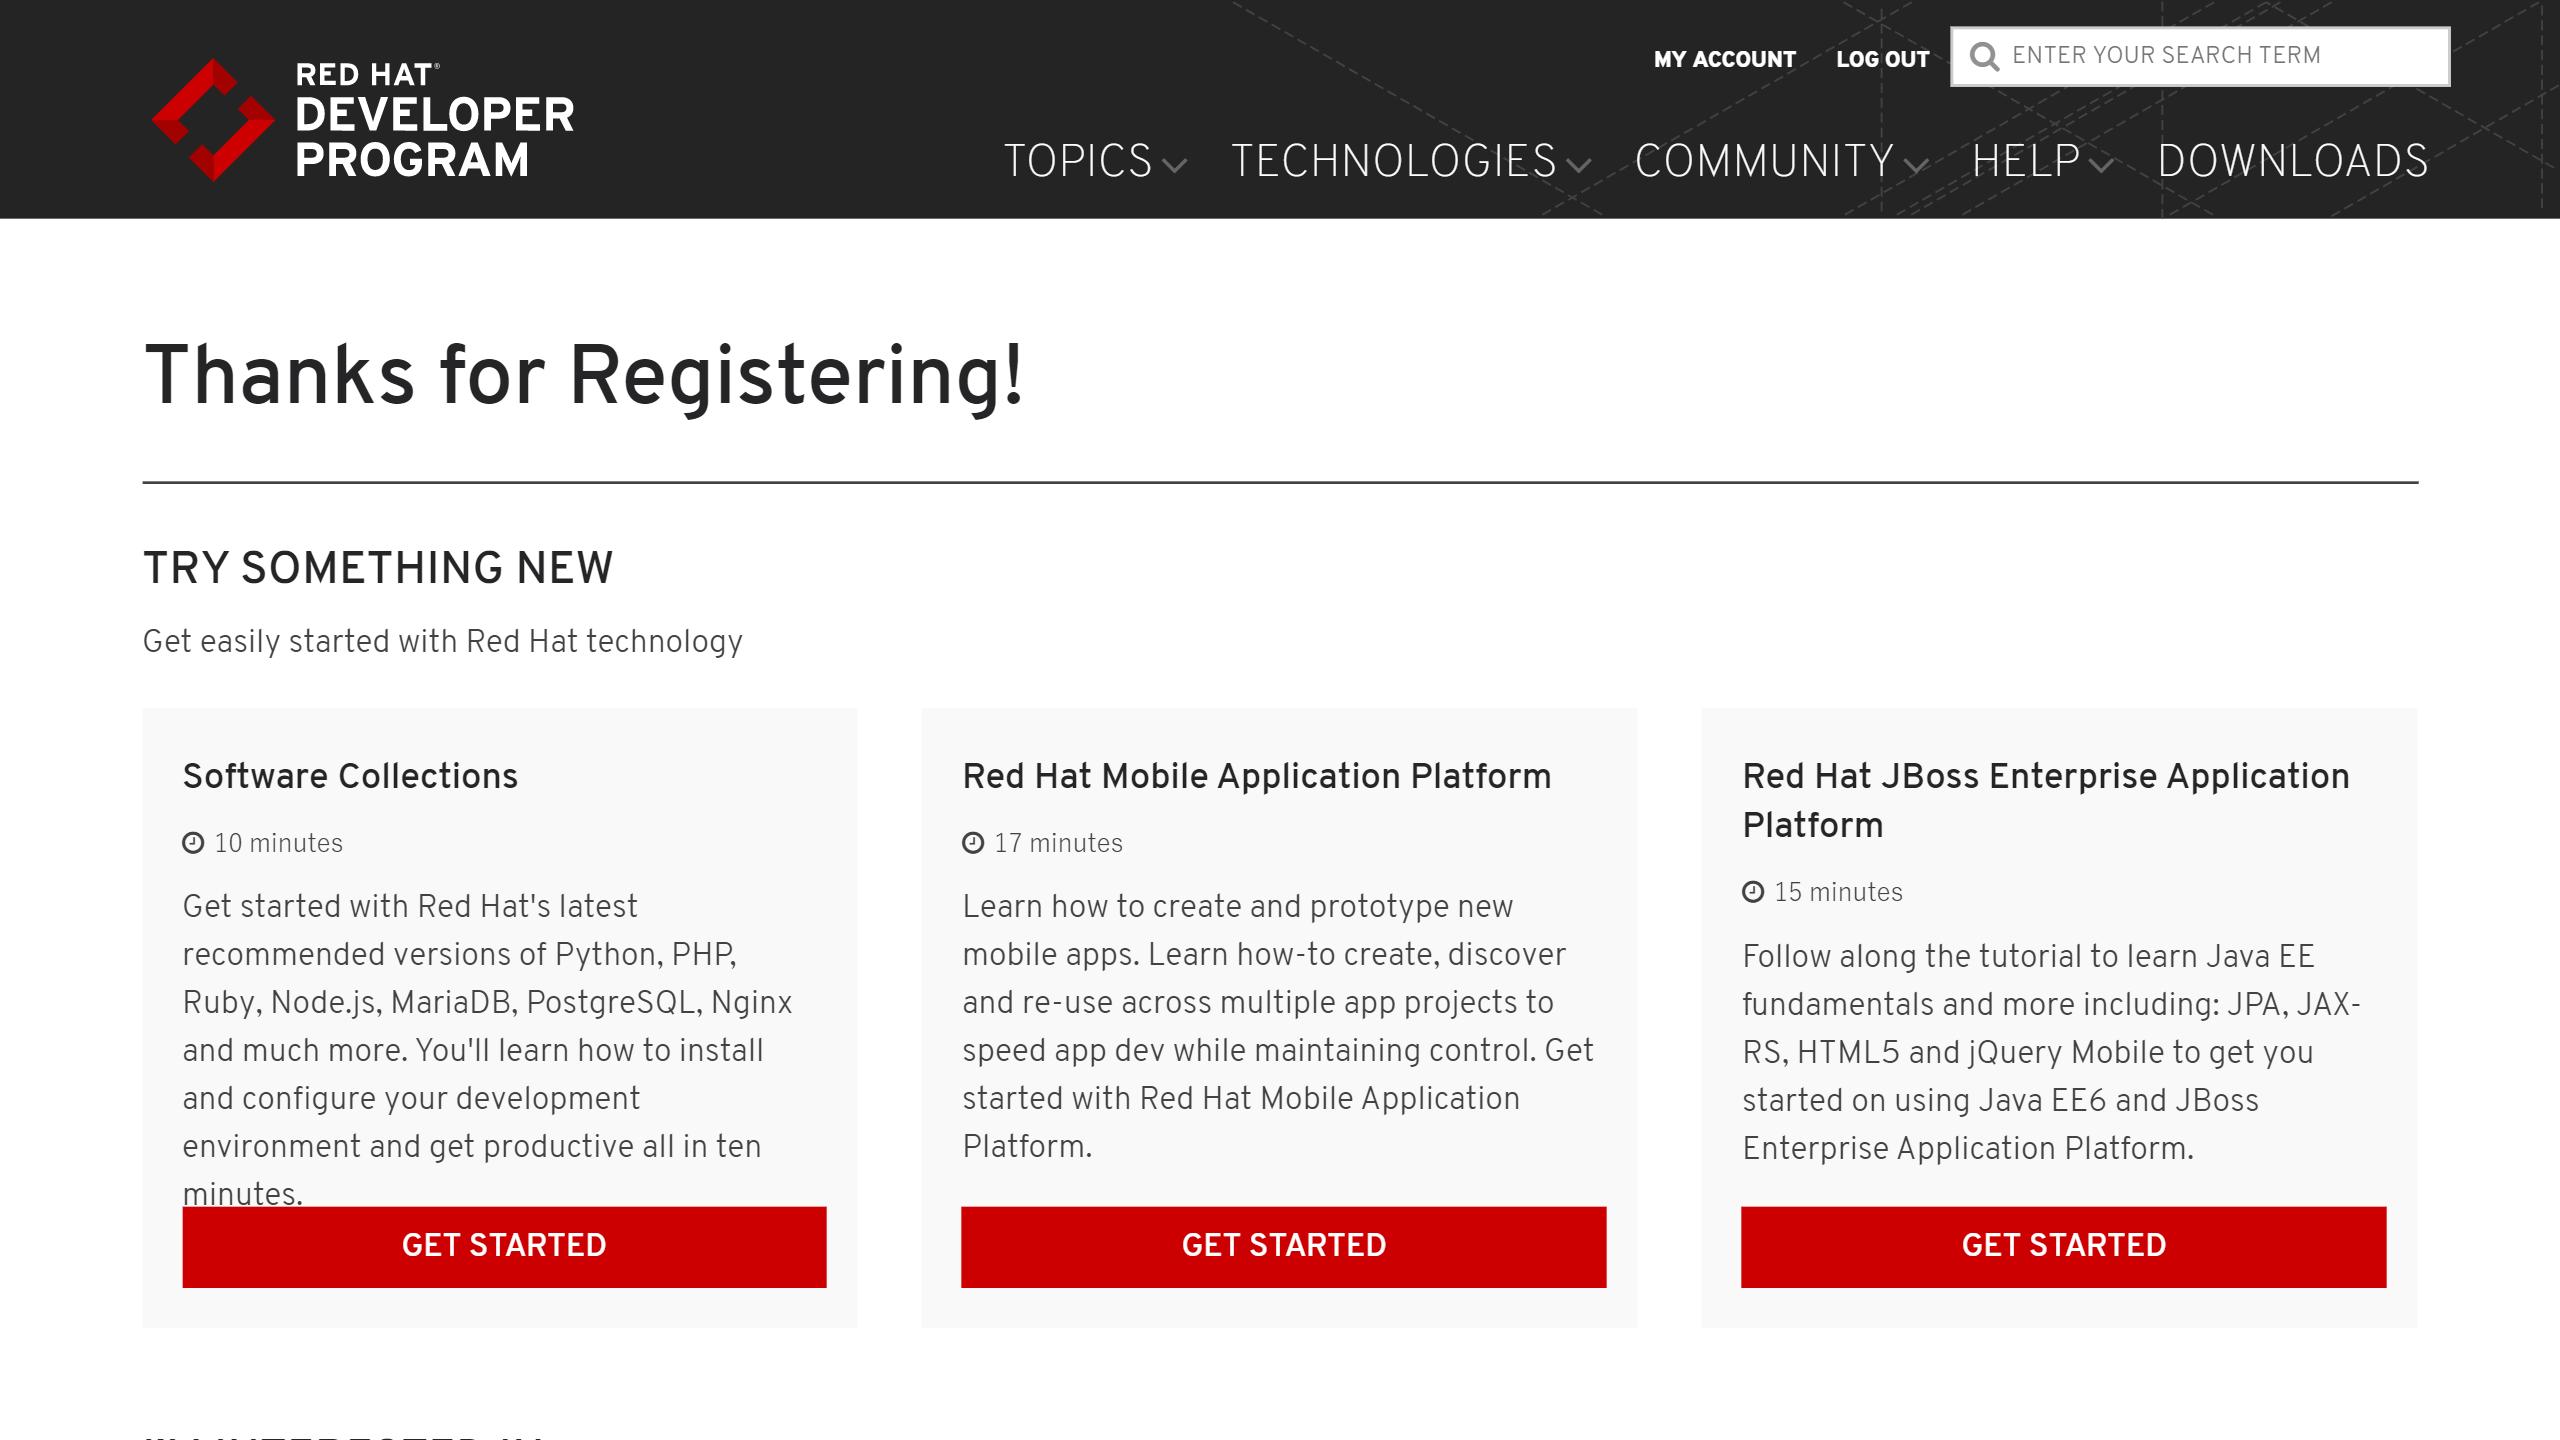 red-hat-developer-program-mail-address-verified